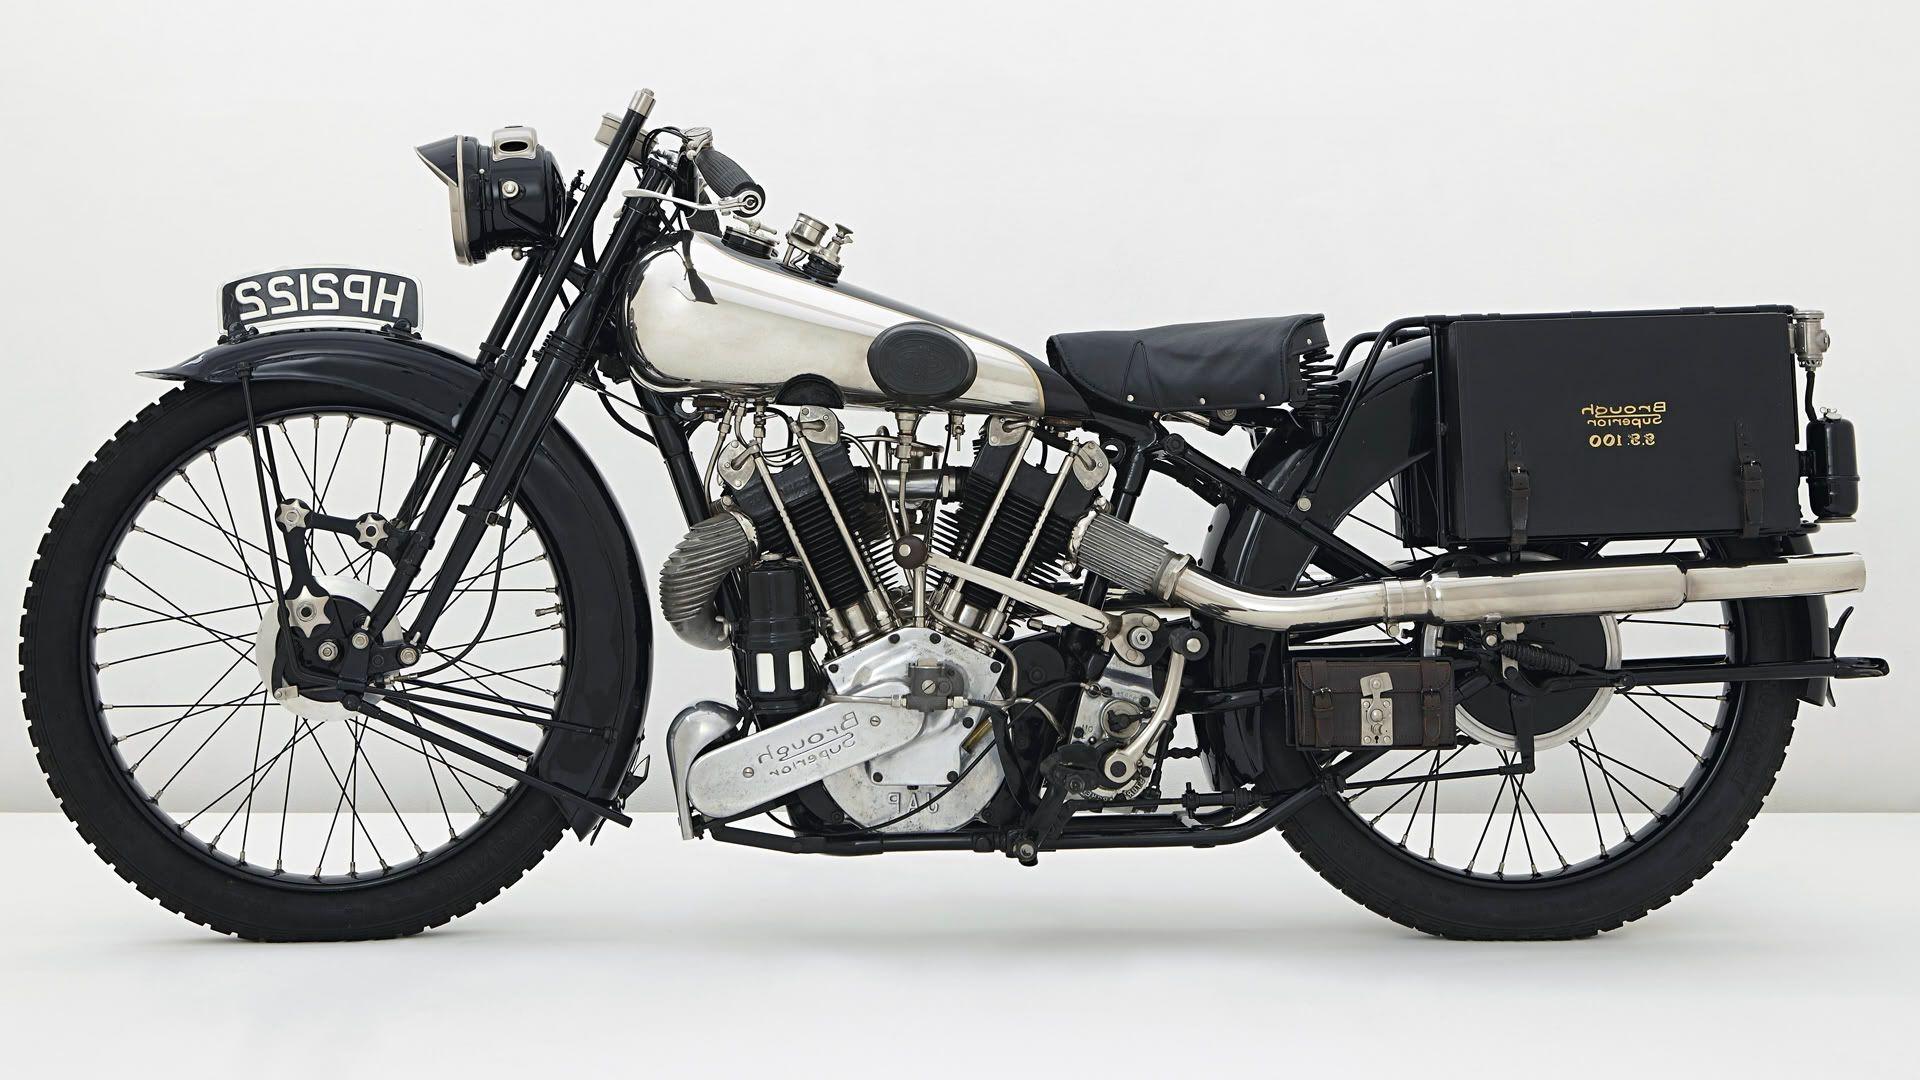 Vintage Motorcycle Wallpaper Images Free Download Vintage